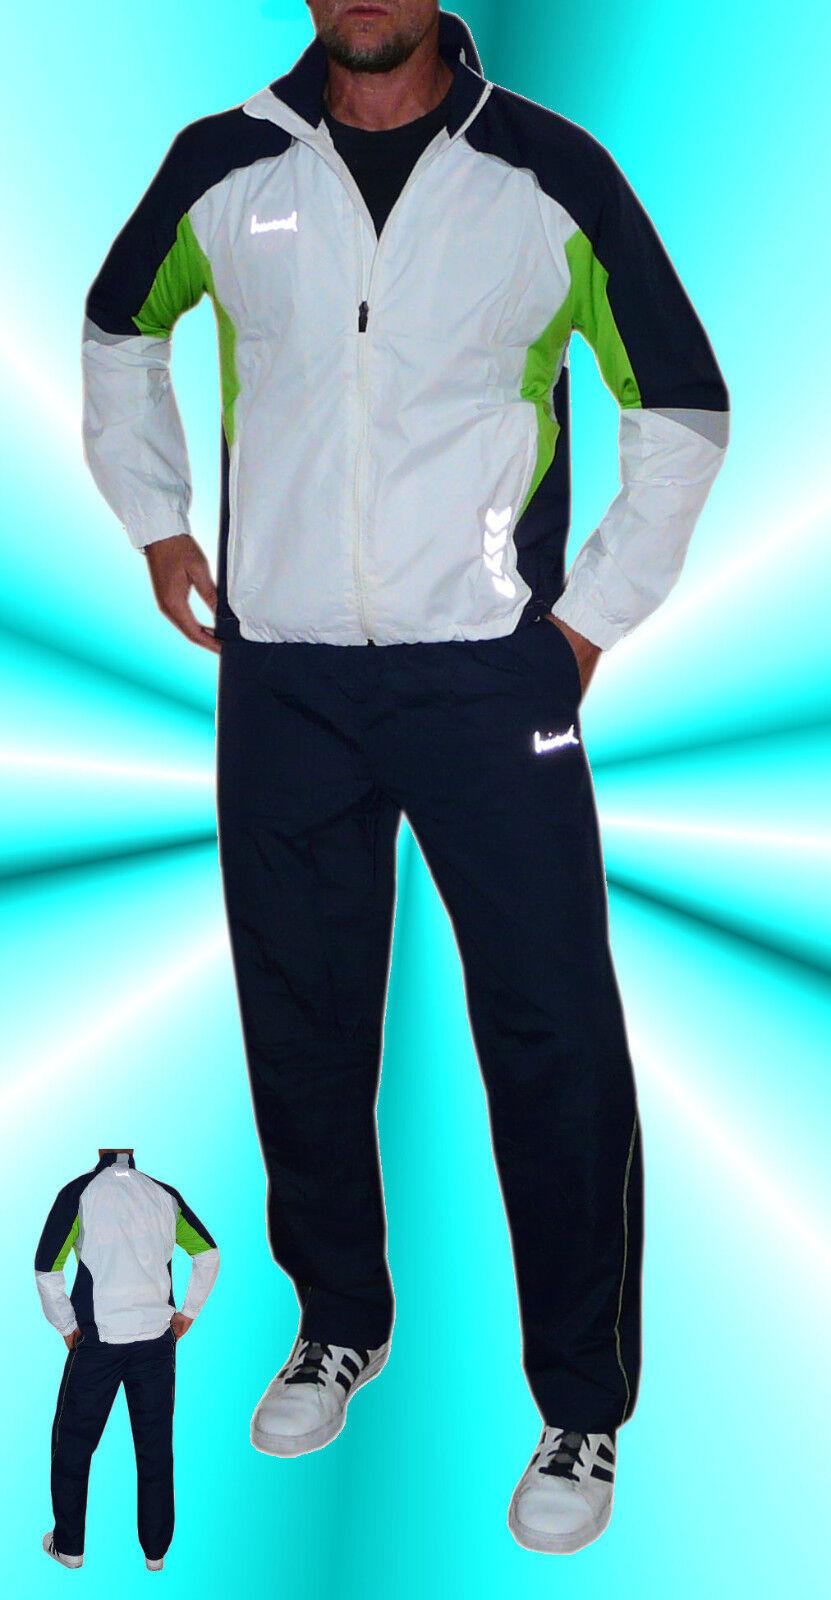 Neu+Hummel+Trainingsanzug+Unisex+Microtec+Tracksuit+Sport+Fitness+Freizeit+